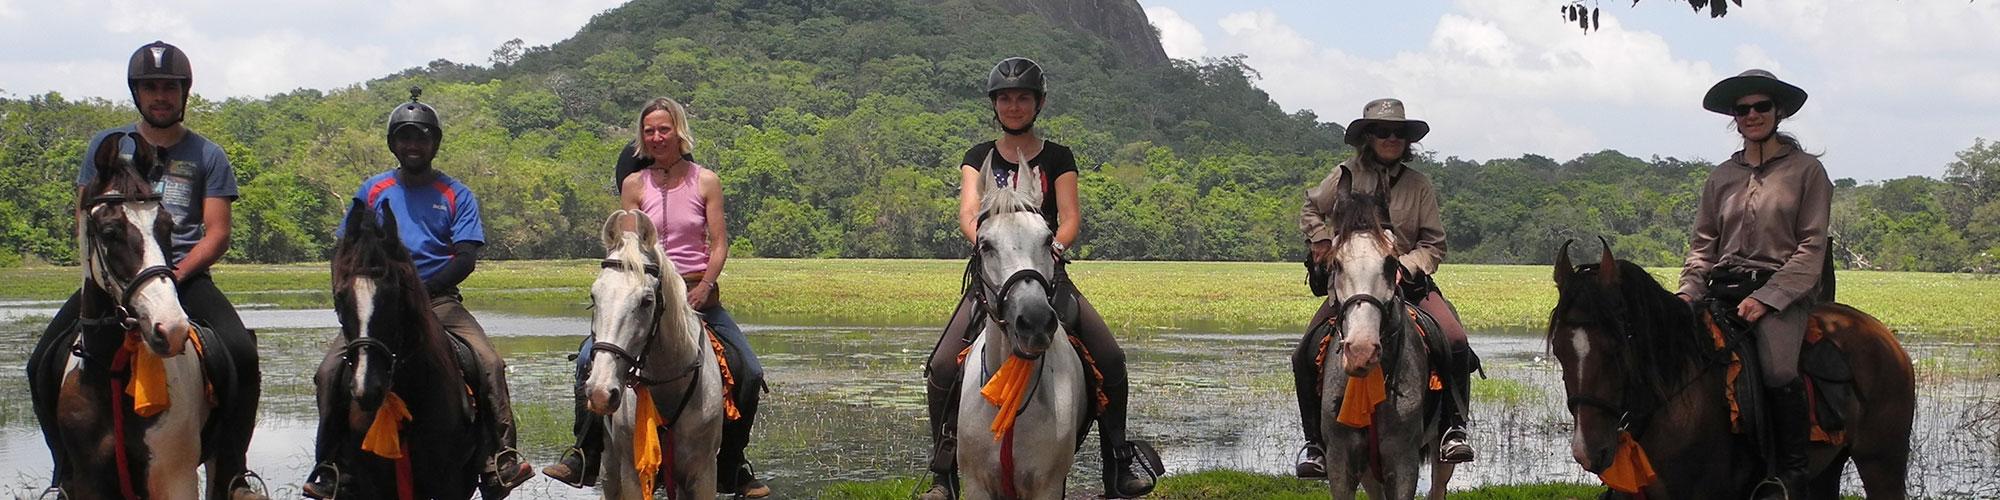 Horse riding in Sigiriya